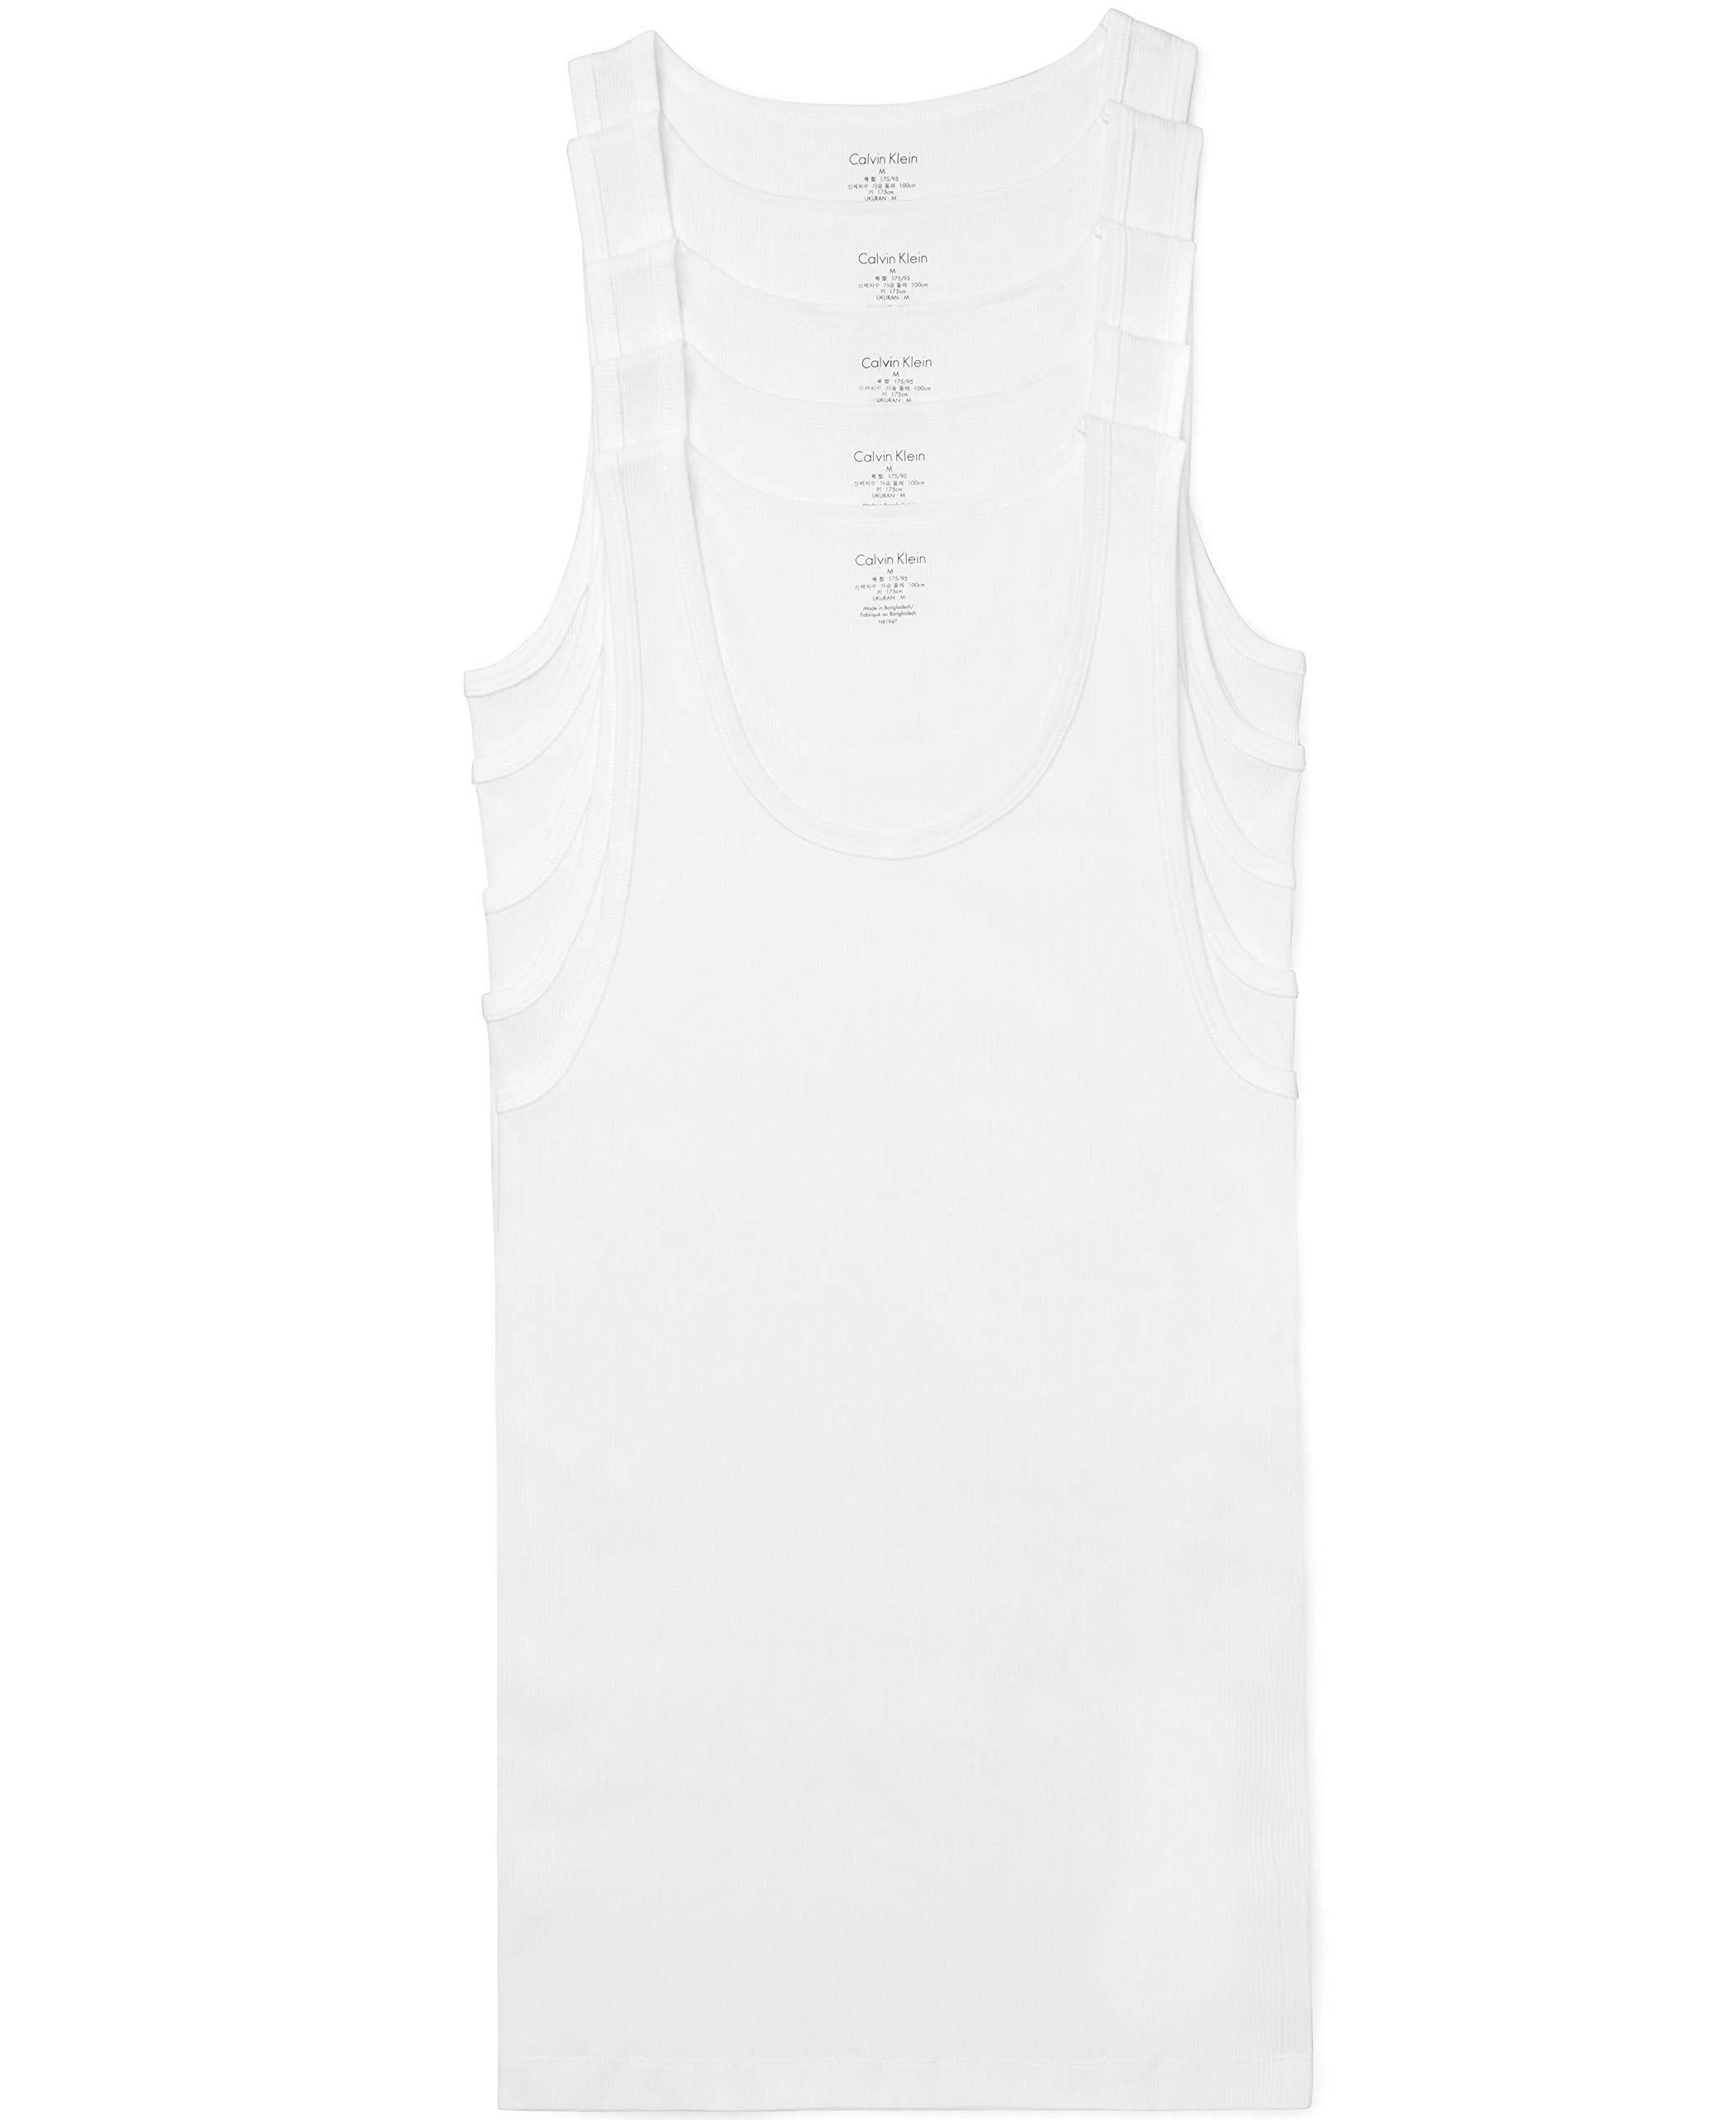 Calvin Klein Men's Cotton Classics Multipack Tanks, White (5 Pack), M by Calvin Klein